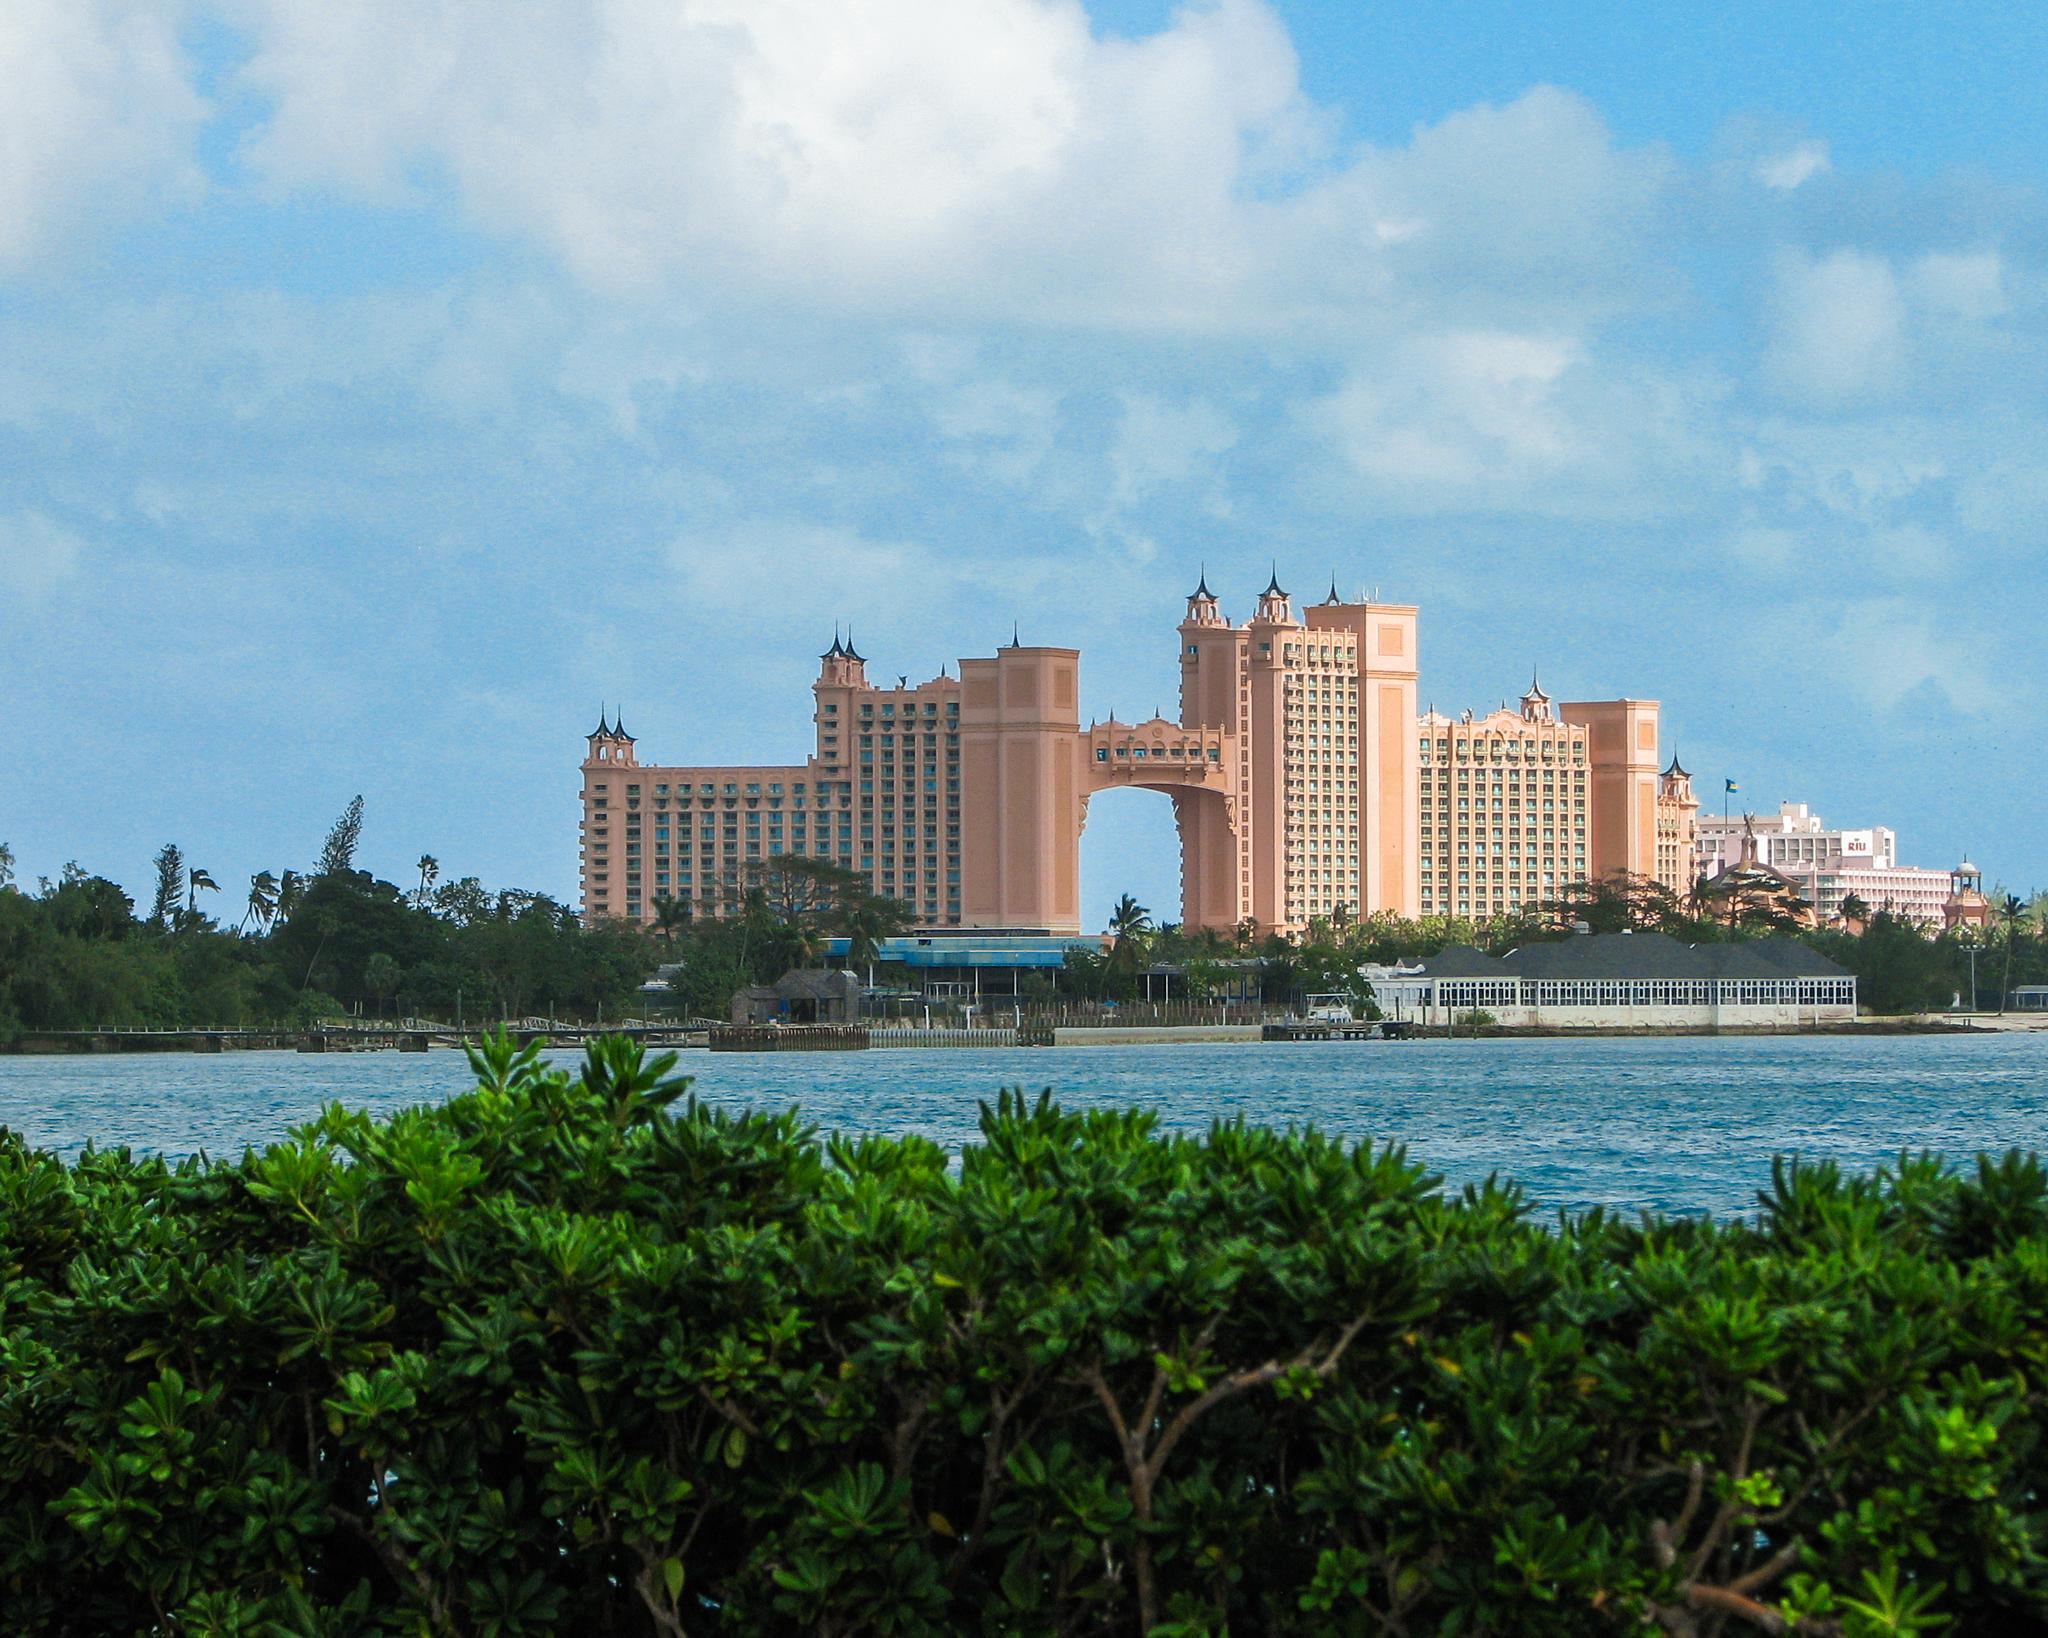 Atlantis by mtmoodyphotography